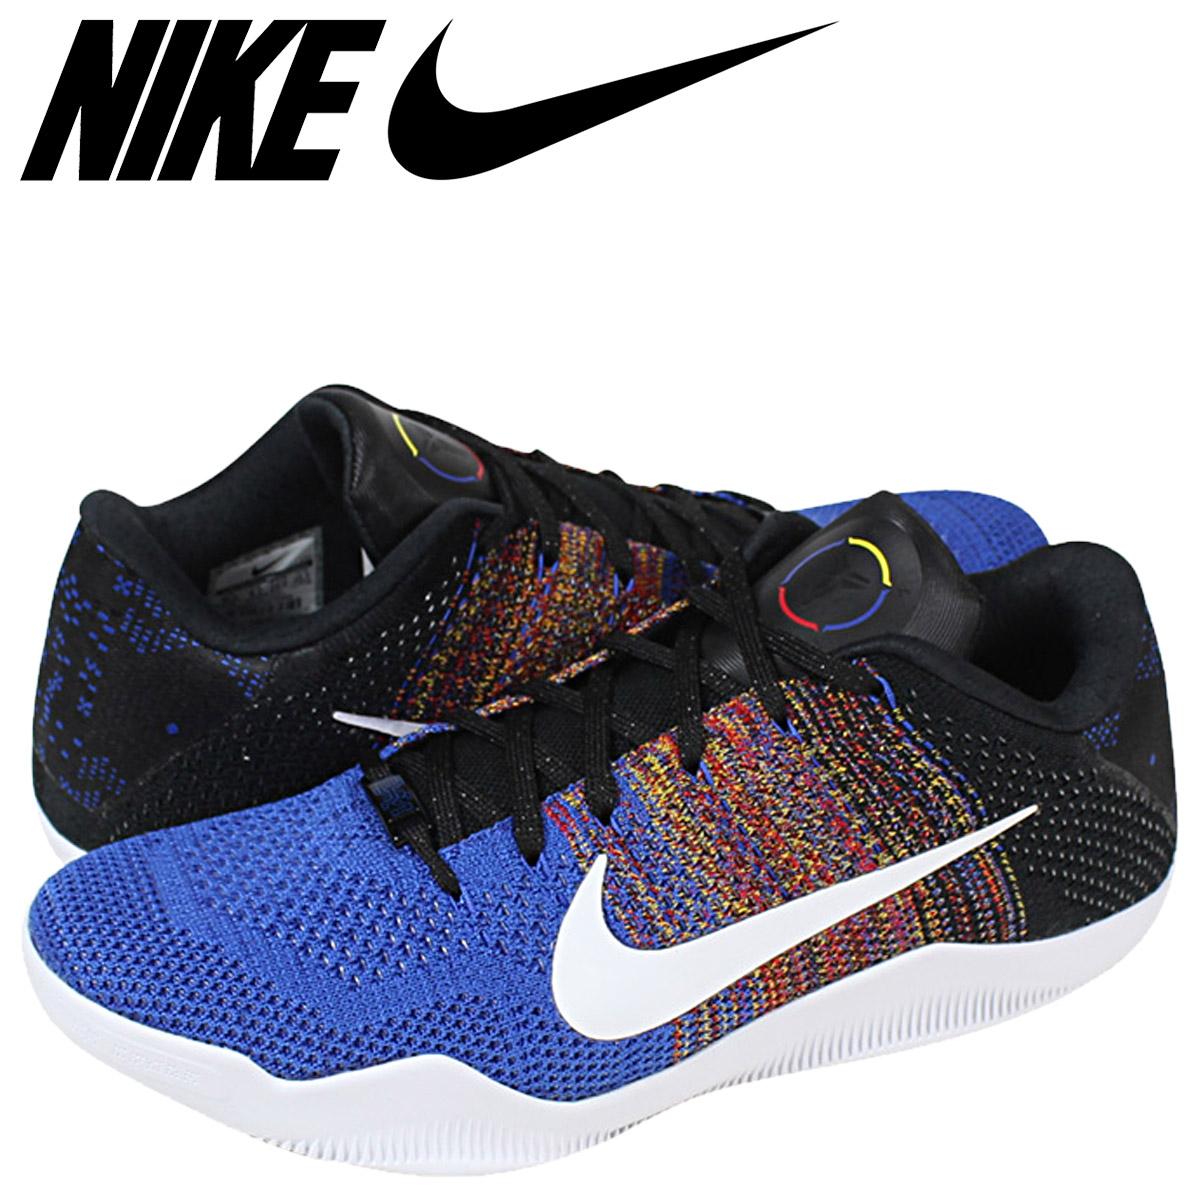 8a34be8c81085 ... Nike NIKE Kobe sneakers KOBE 11 ELITE LOW BHM 822522-914 blue mens ...